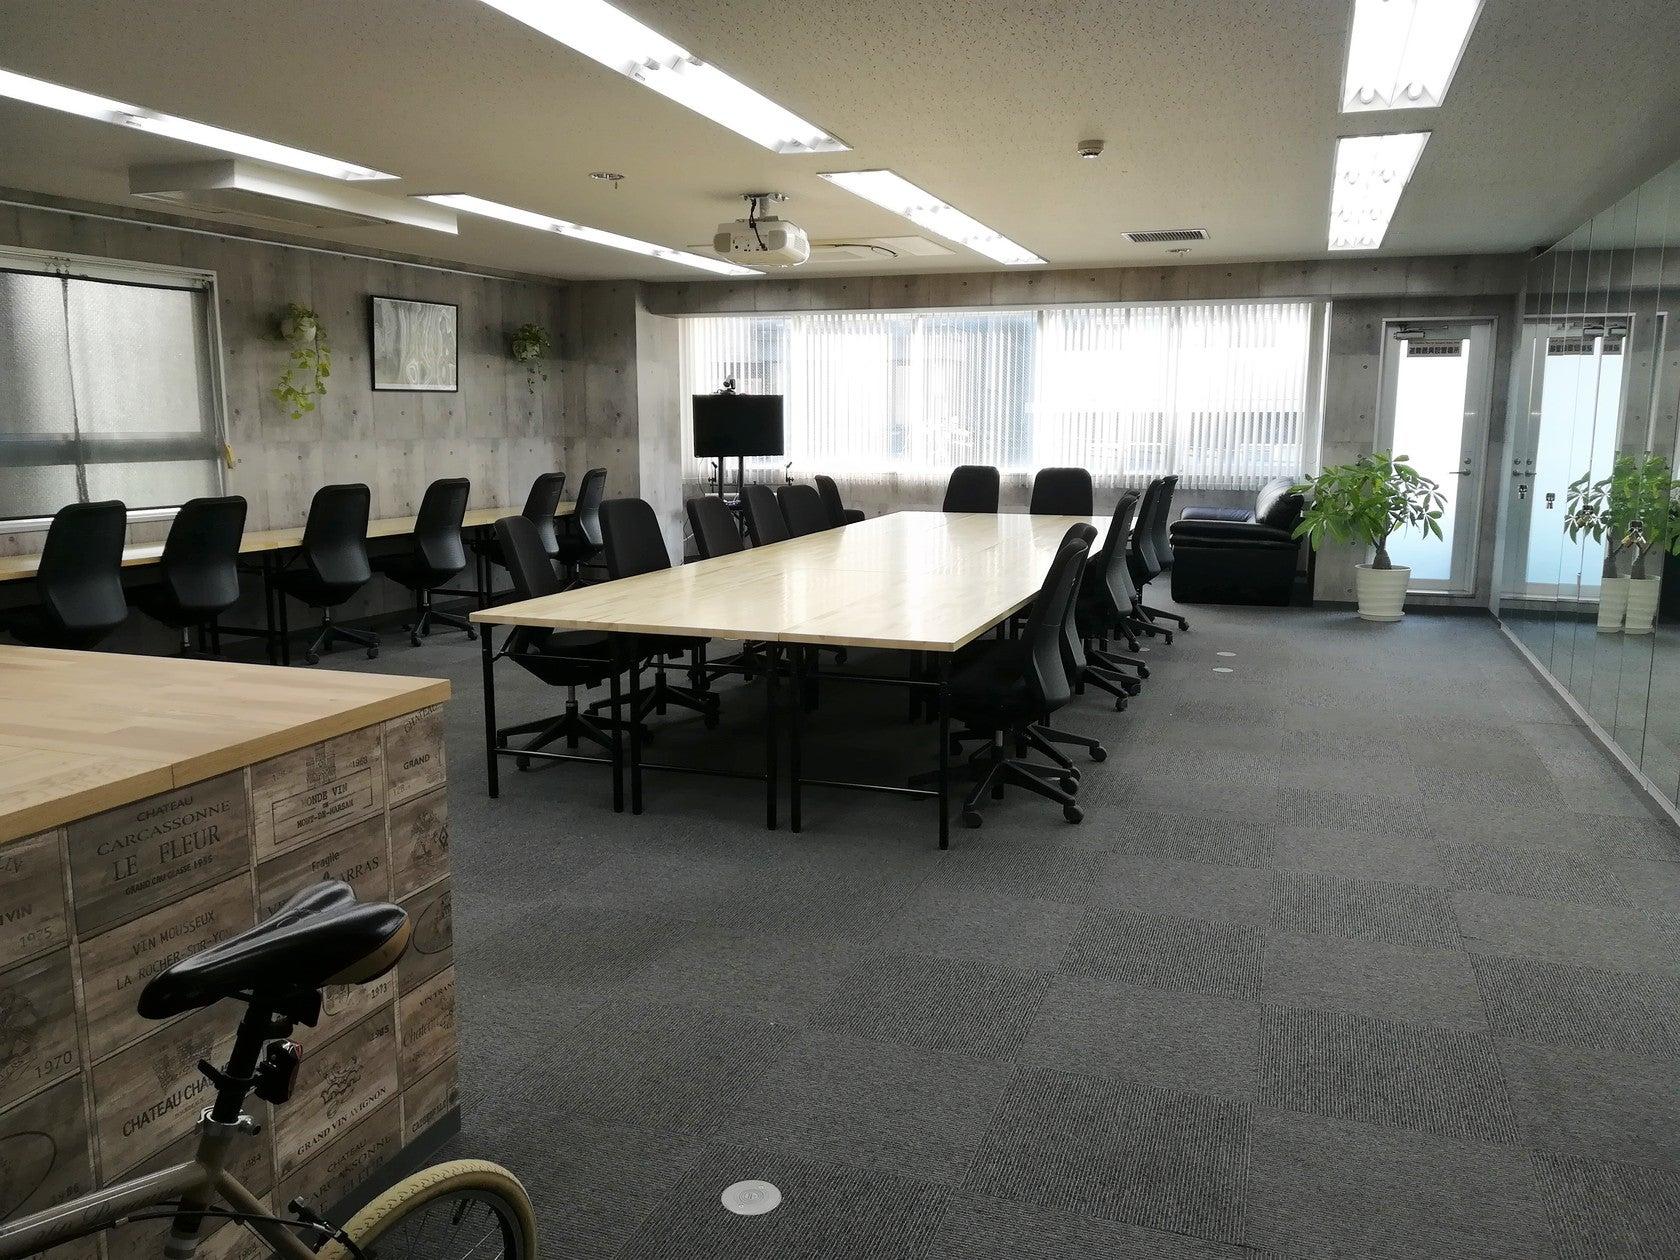 Web会議や大型スクリーンで映画鑑賞も…多様に使えるミーティングスペース demokura(ビジネスゾーン本町西ビル5階 レンタルスペース demokura) の写真0